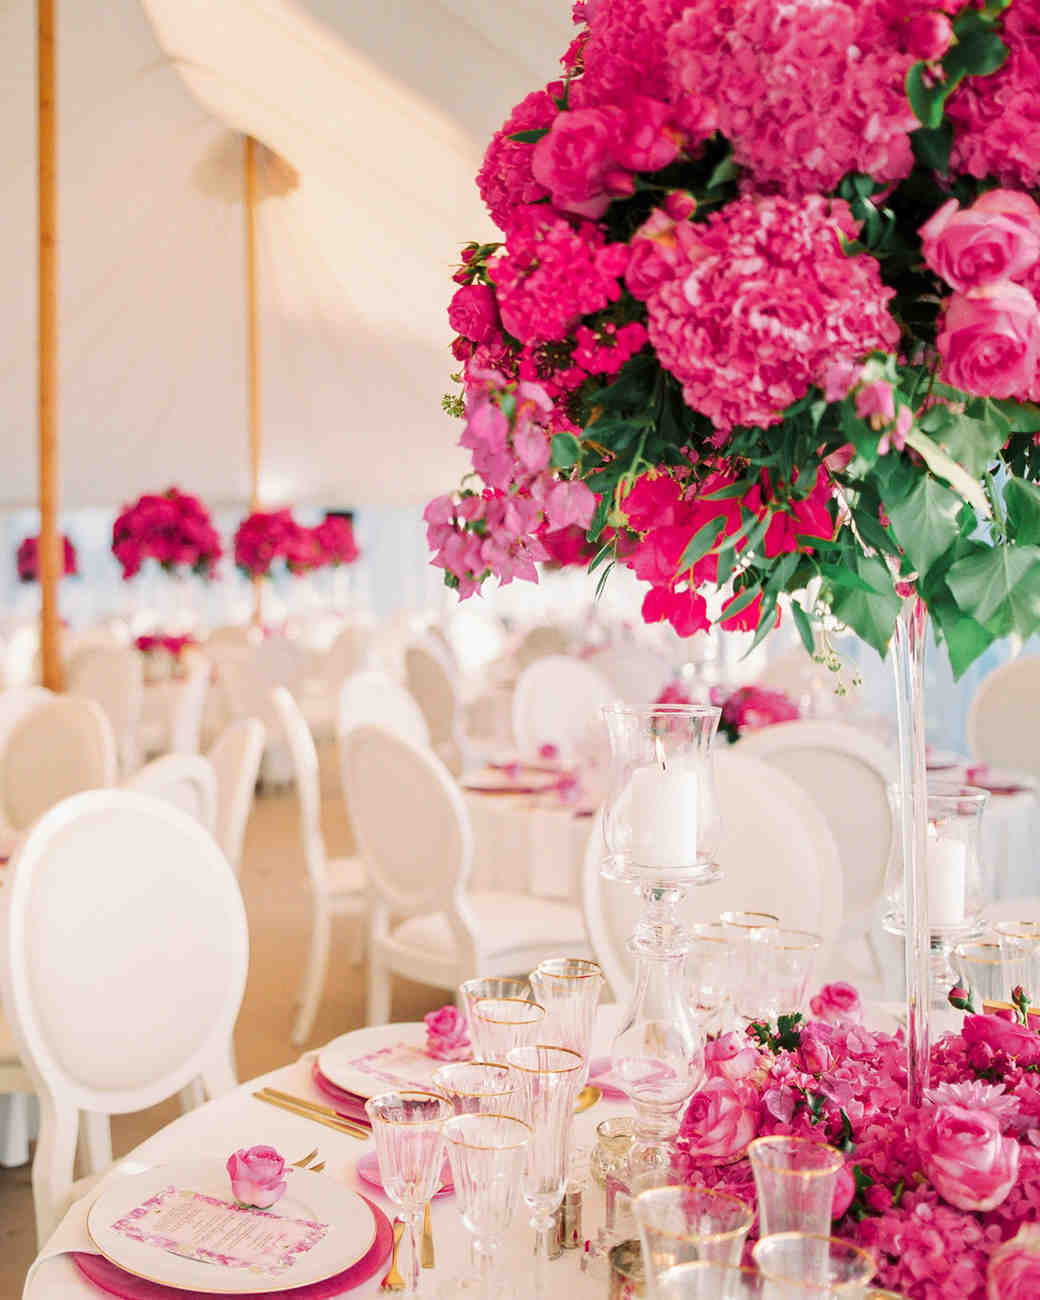 stephanie nikolaus wedding reception